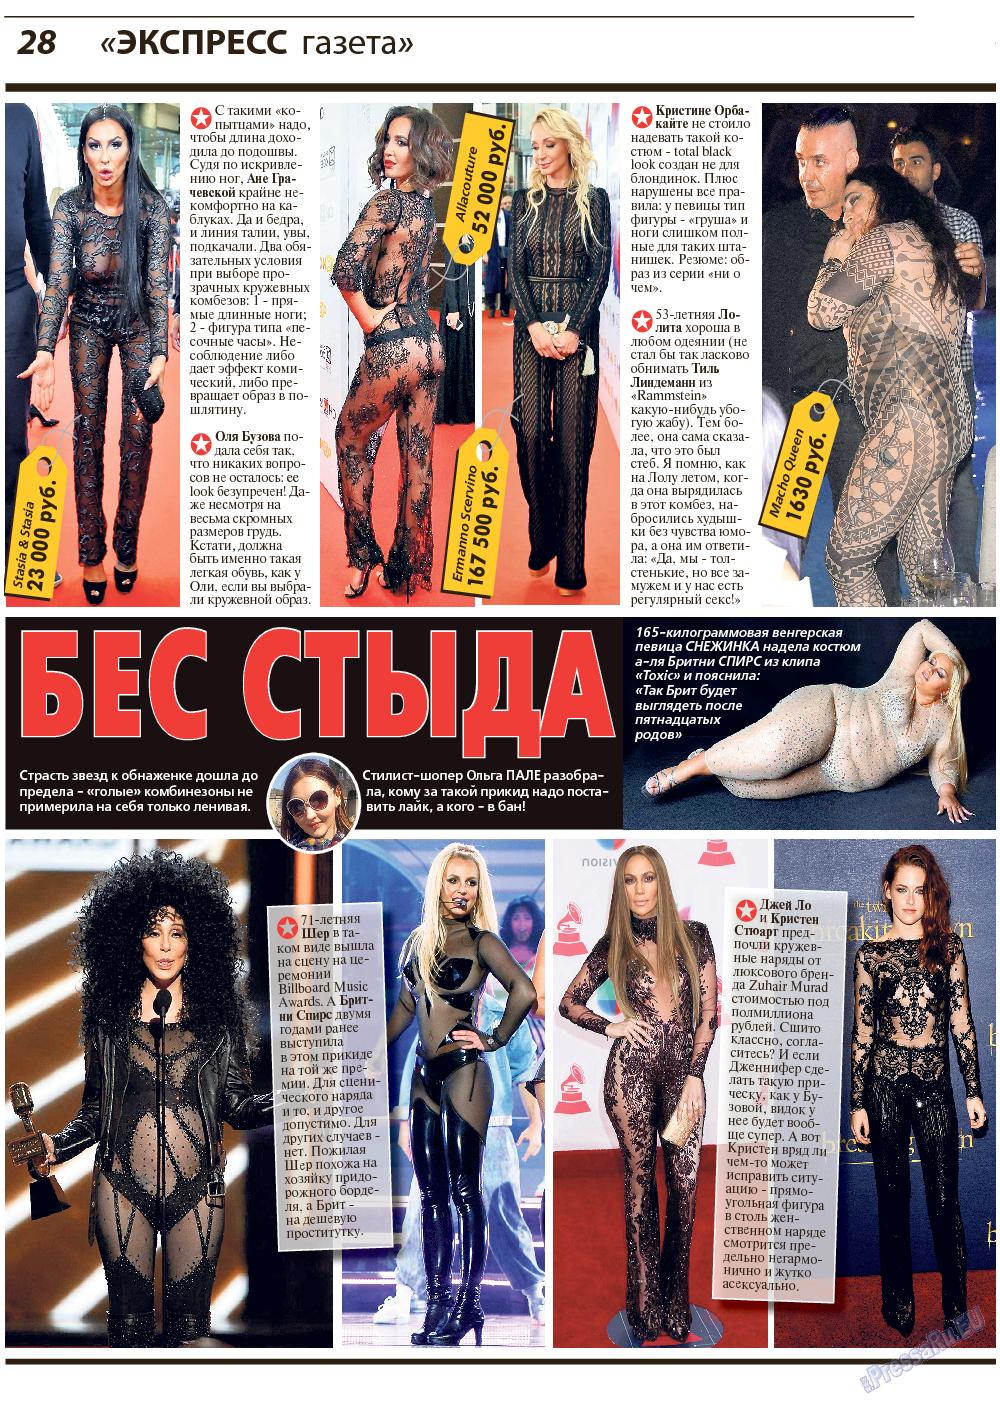 Экспресс газета (газета). 2017 год, номер 11, стр. 28